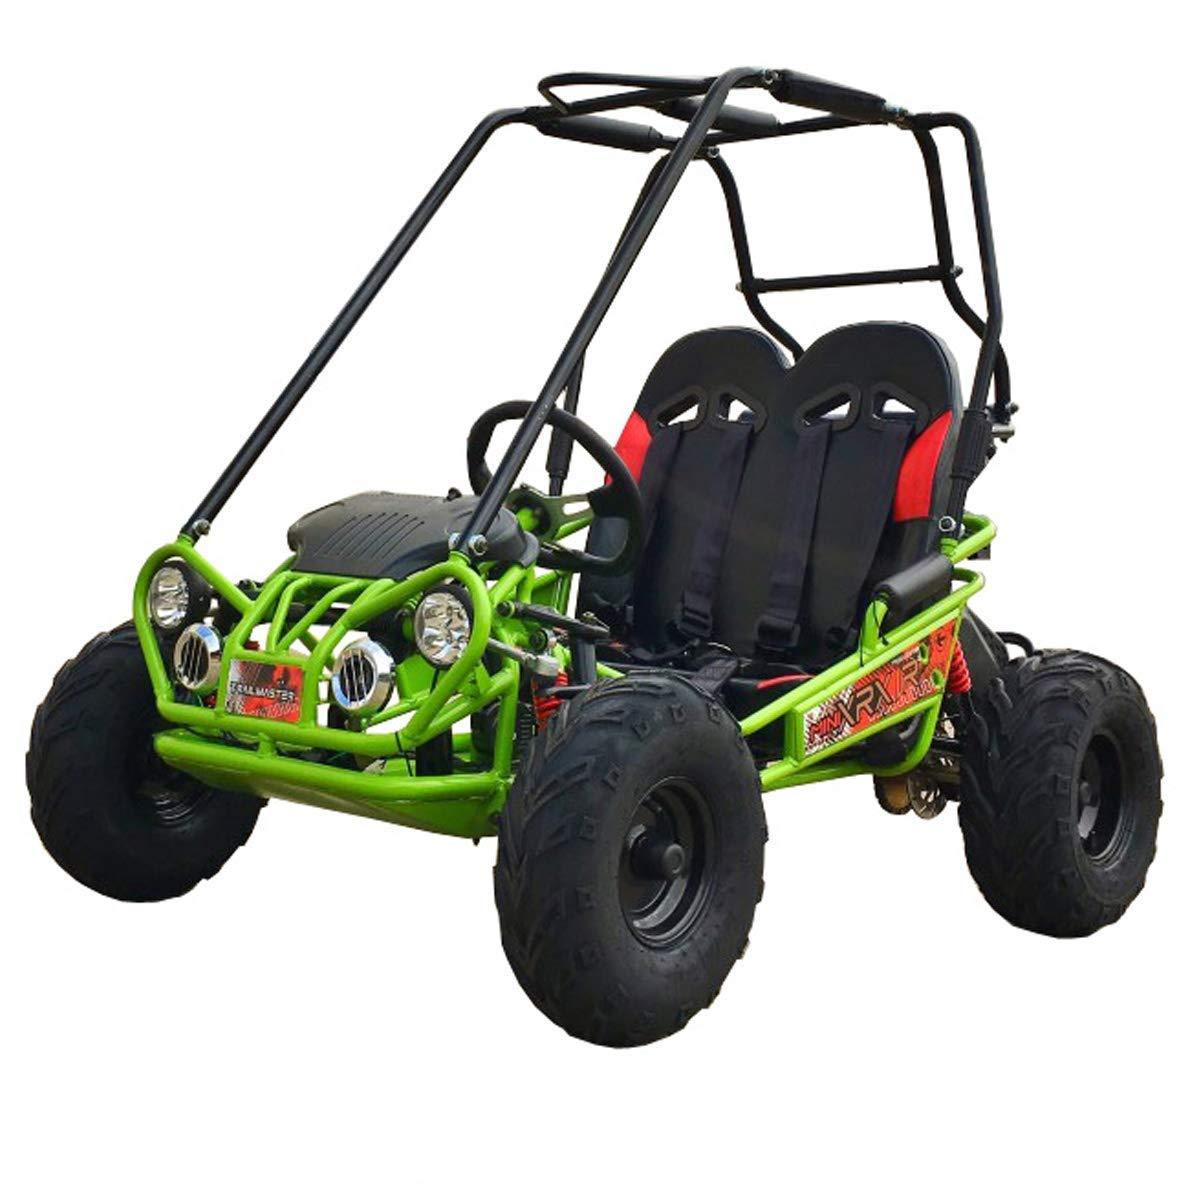 X-PRO 163cc Kid Size Go Kart with Reverse Youth Go Kart Dune Buggy Kids Go Cart Gokart 2 Seater Go Kart